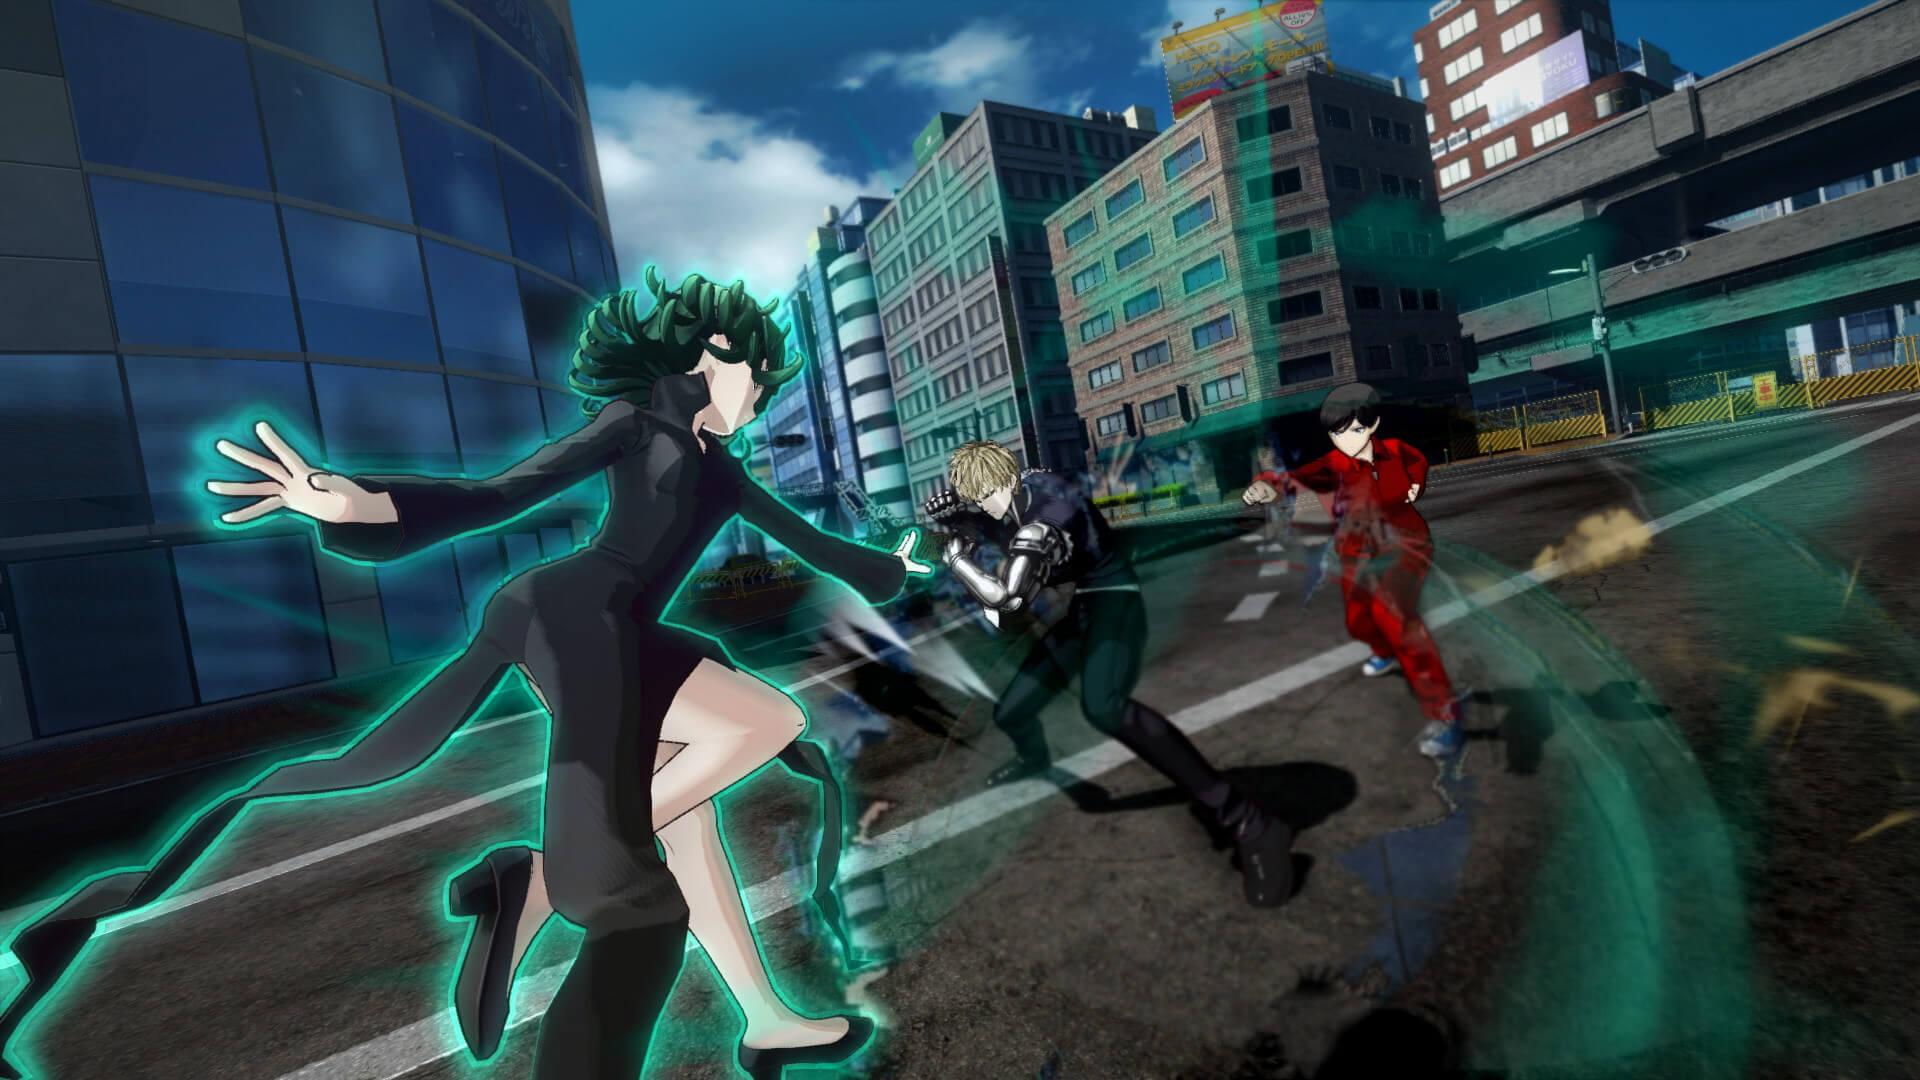 Скриншот из игры ONE PUNCH MAN: A HERO NOBODY KNOWS